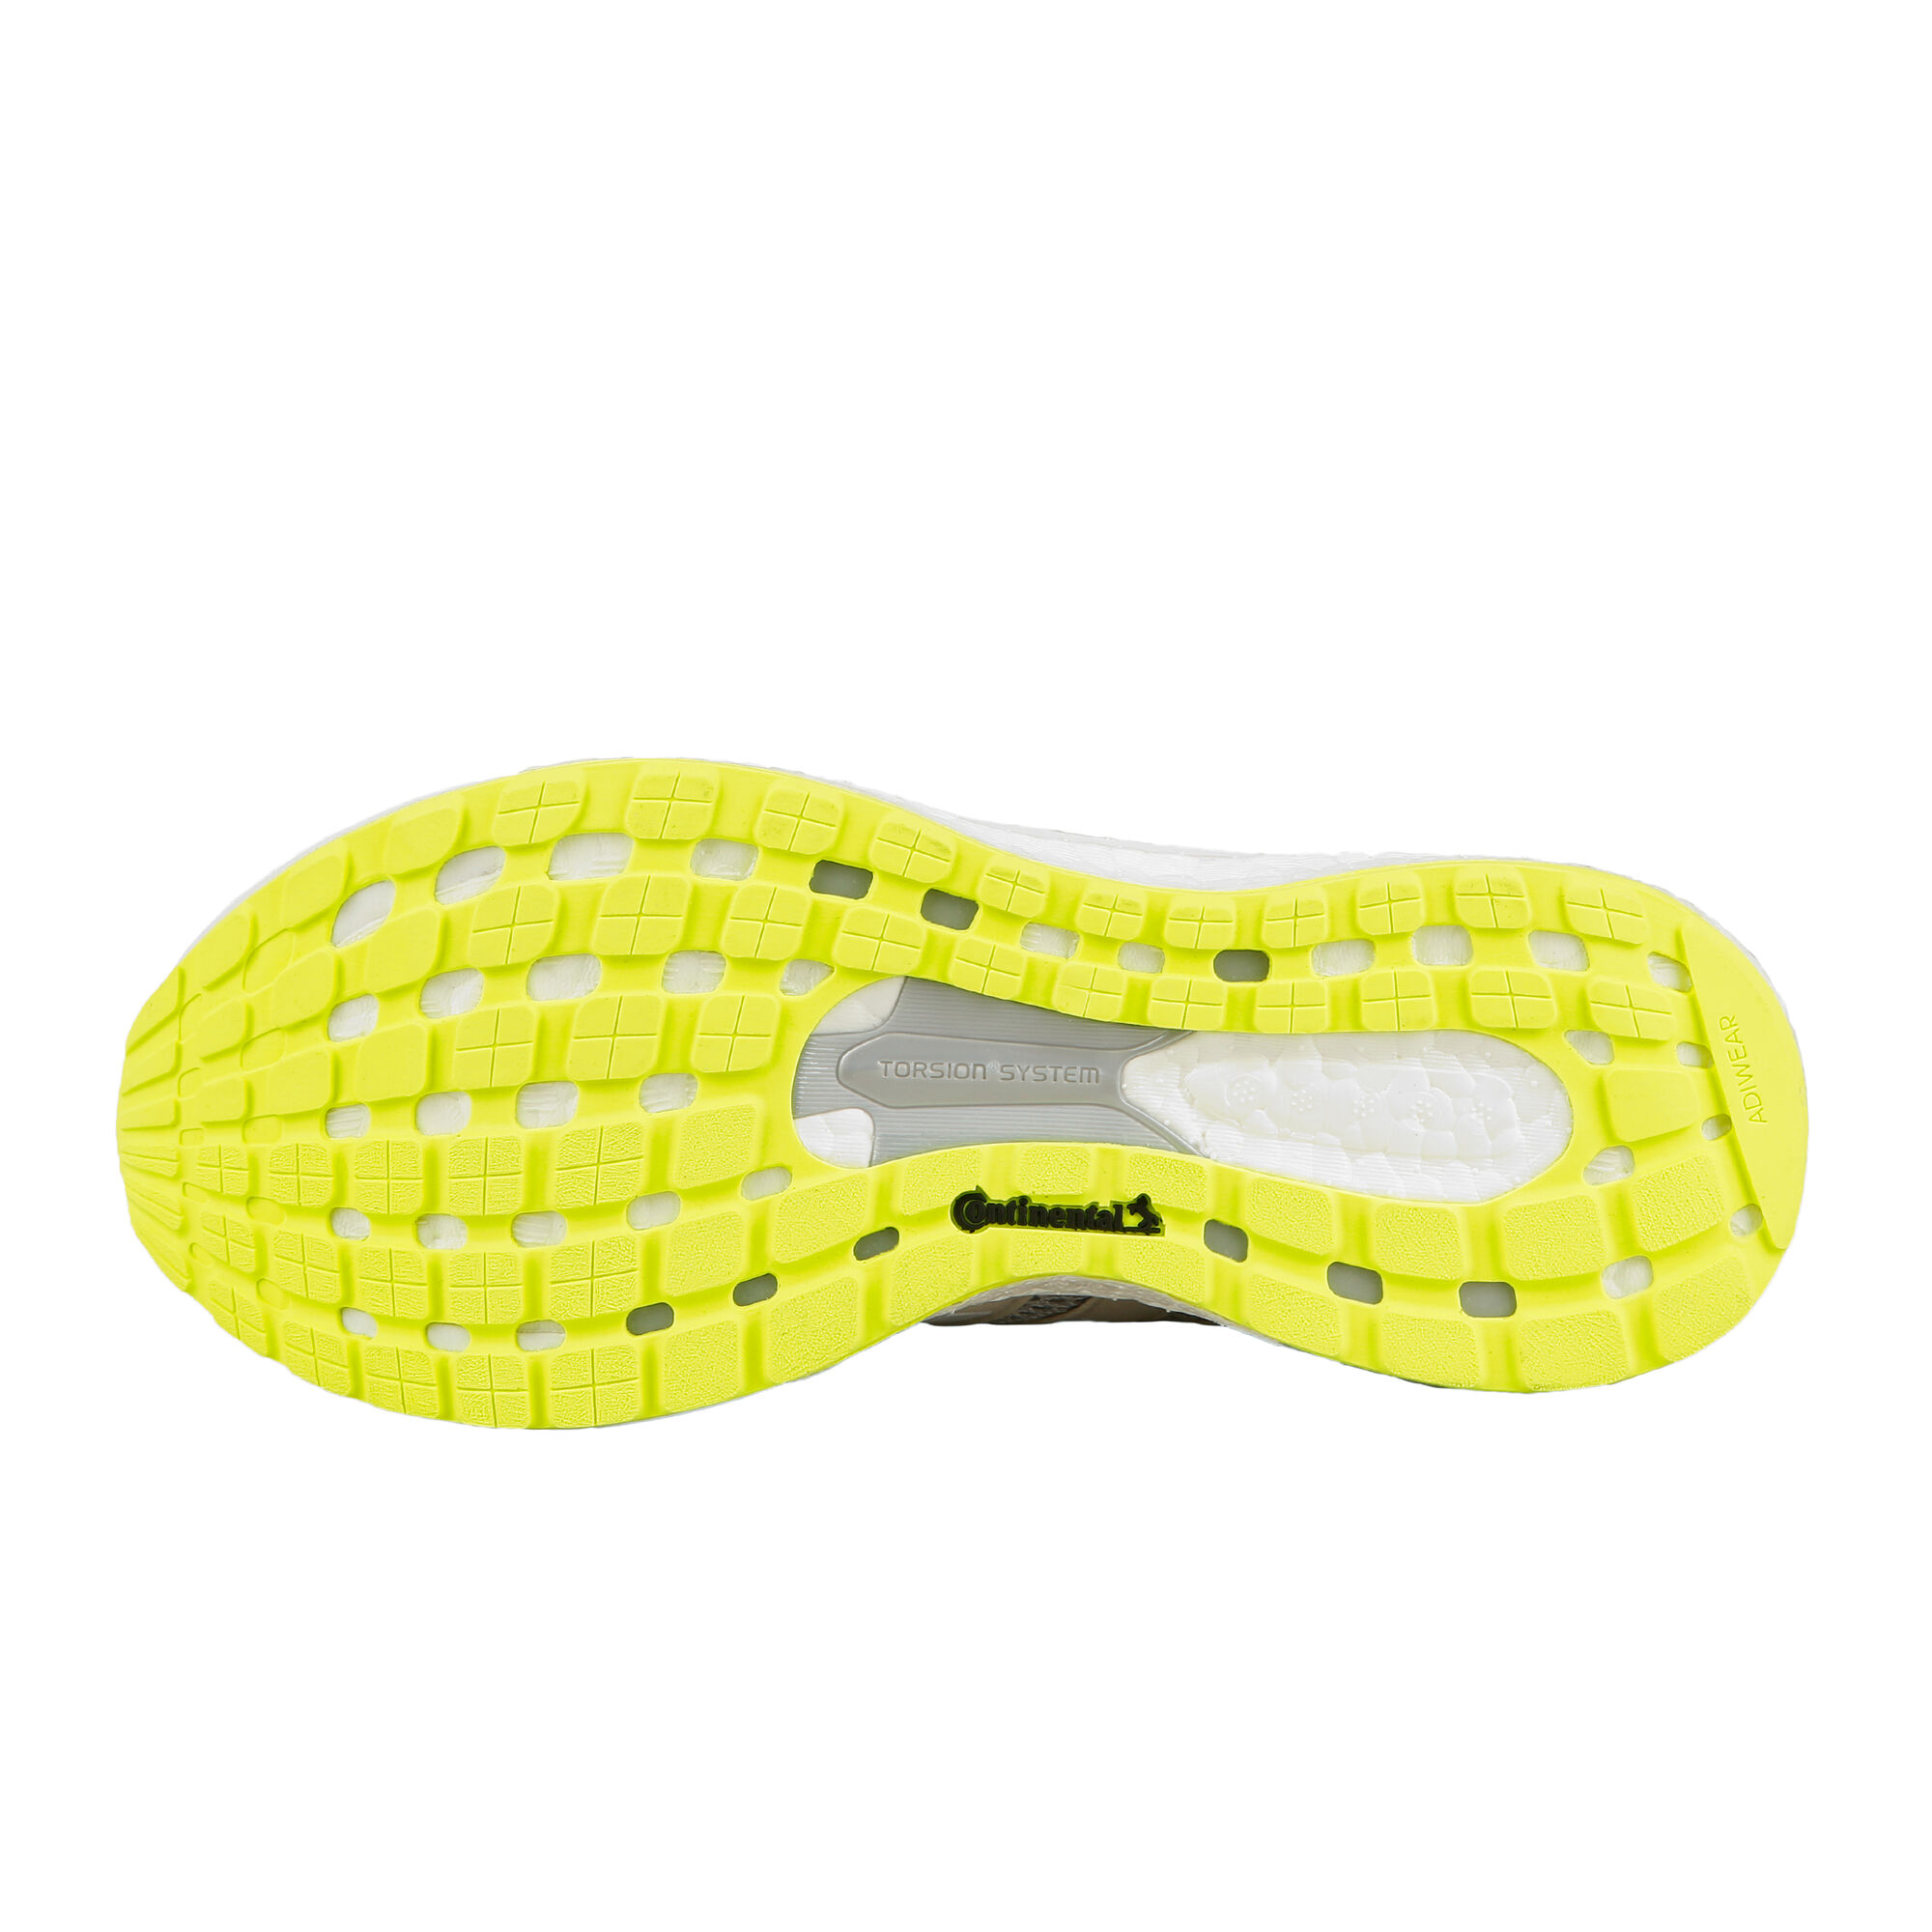 new product d240b ca0a7 adidas · adidas · adidas · adidas · adidas · adidas · adidas. Adizero Tempo  9 Women ...